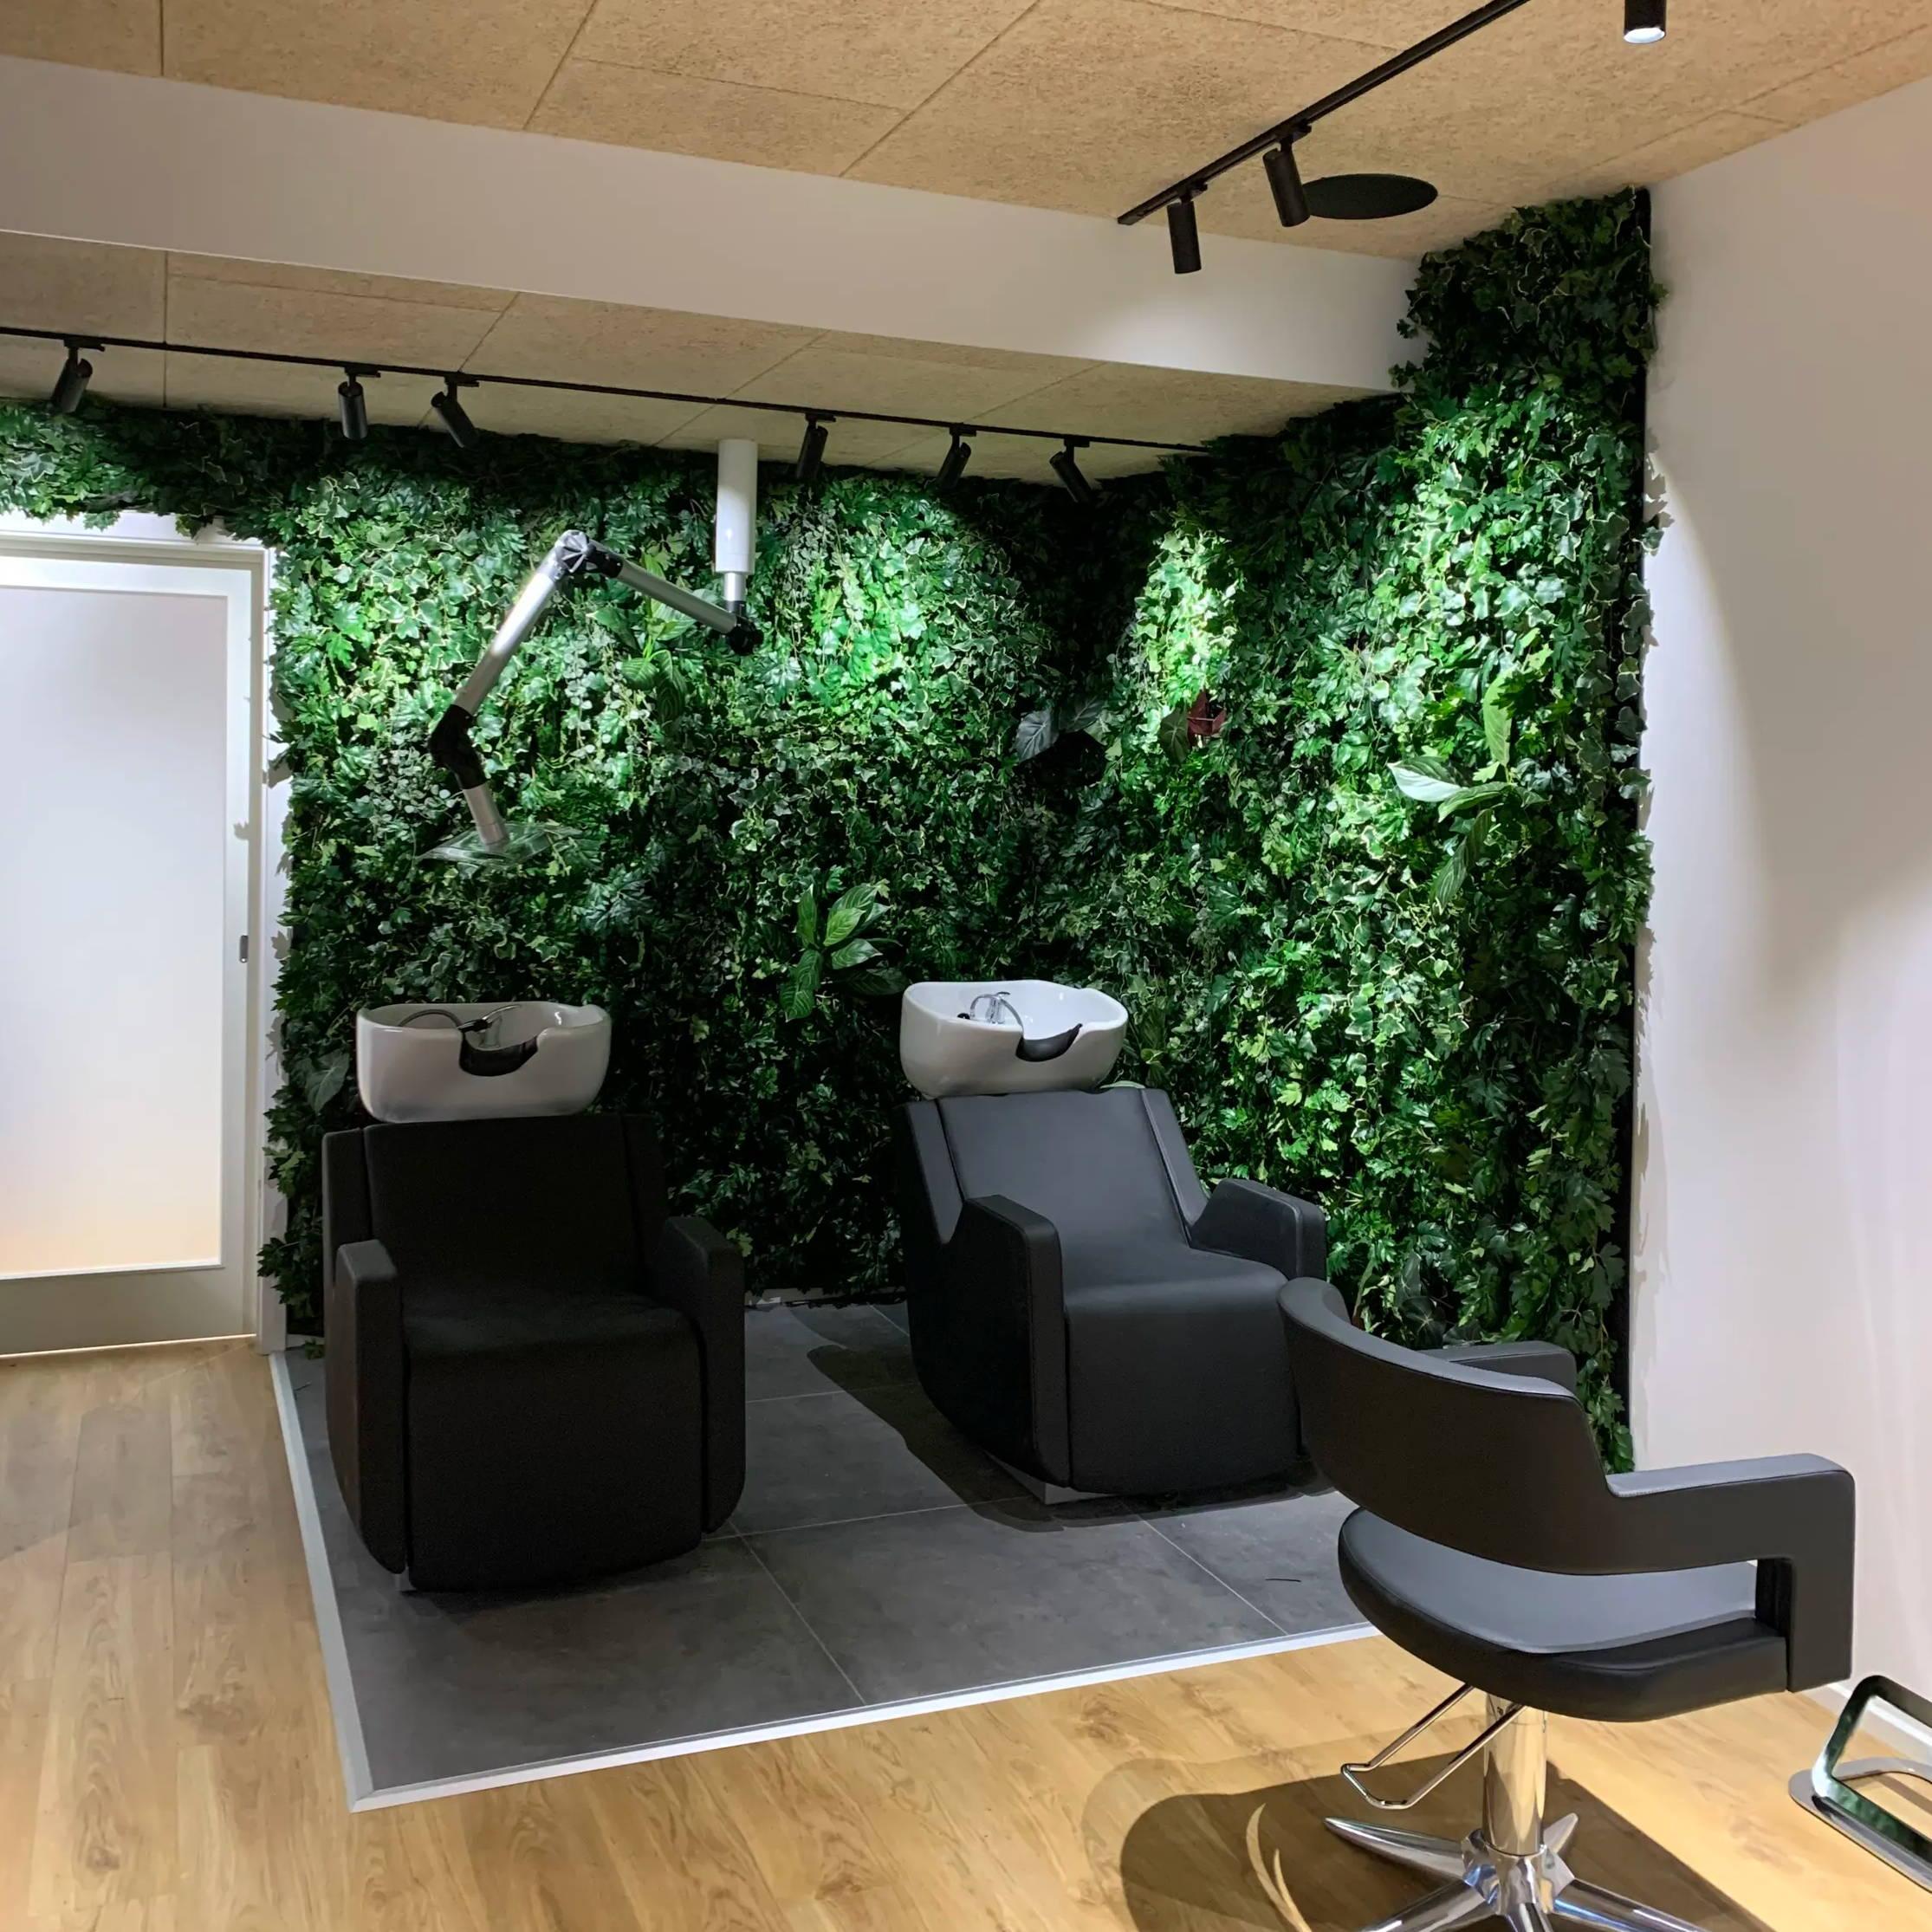 plantevæg hos frisør